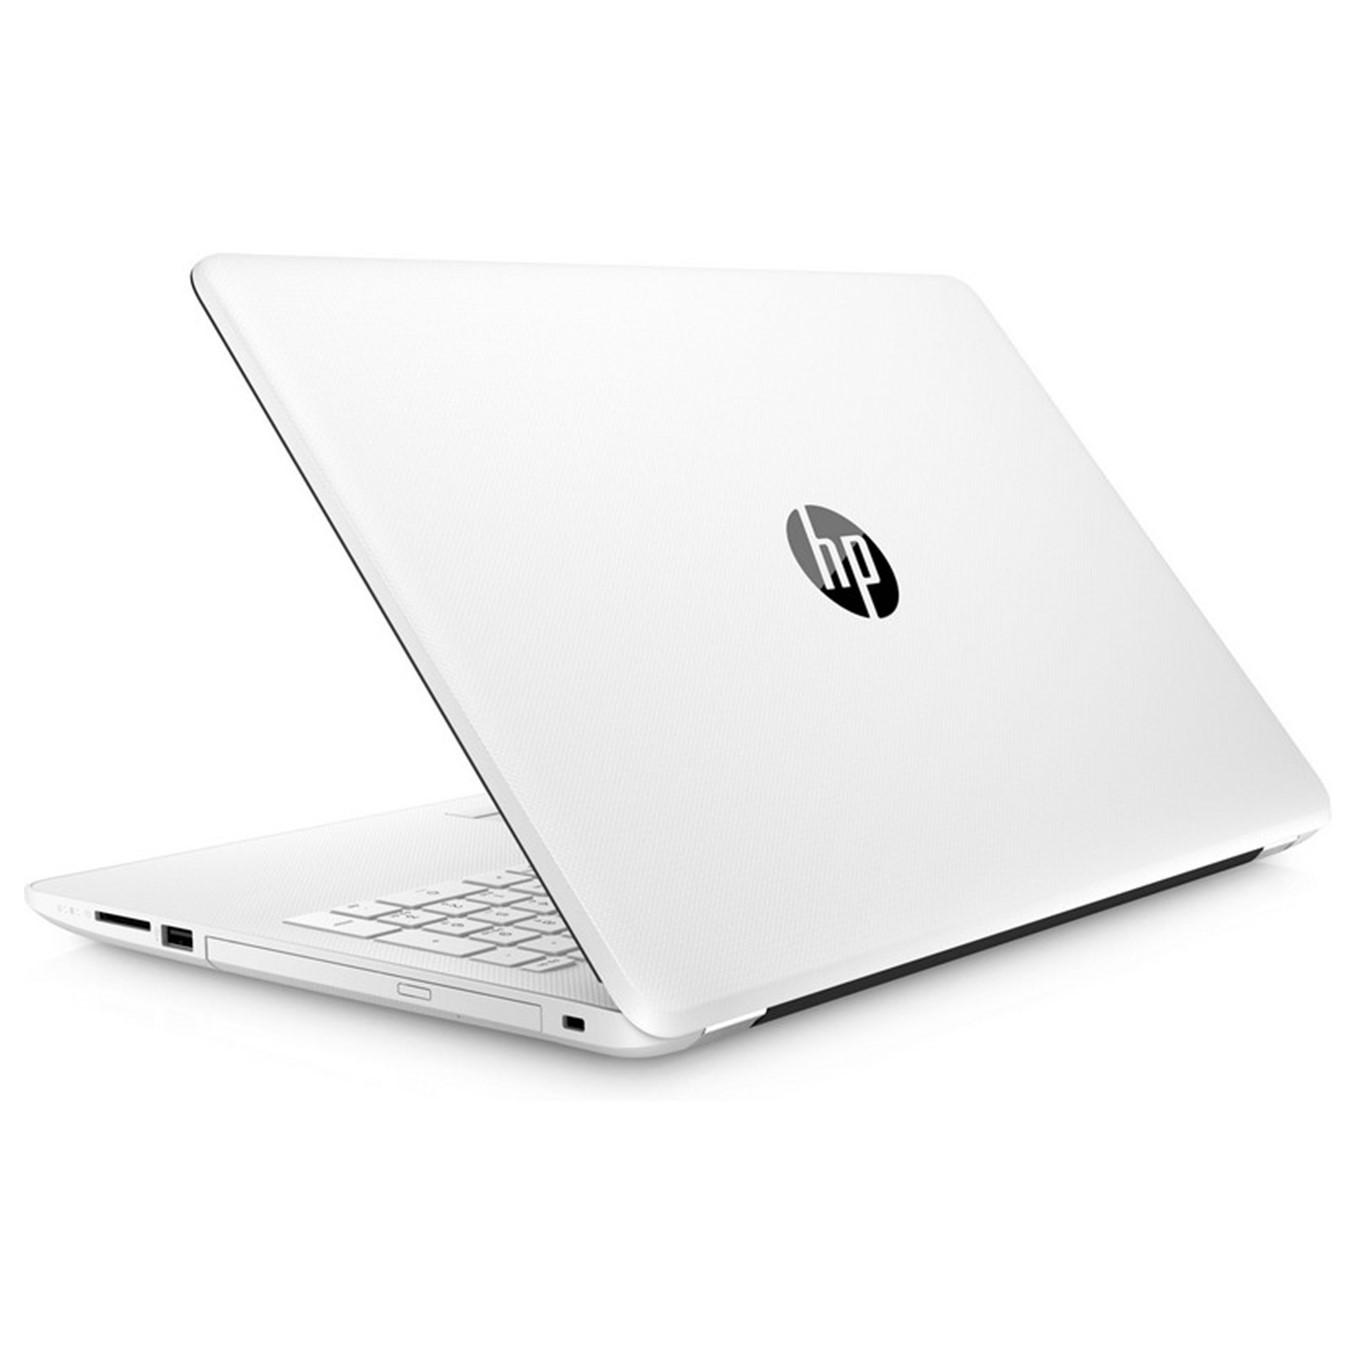 "PORTTIL HP 15-BS535NS - I5-7200U 2.5GHZ - 8GB - 256GB SSD - RAD 520 2GB - 15.6""/39.6CM HD - DVD RW - HDMI - BT - USB2.0 - 2XUSB3.1 - W10 HOME 64B - B"